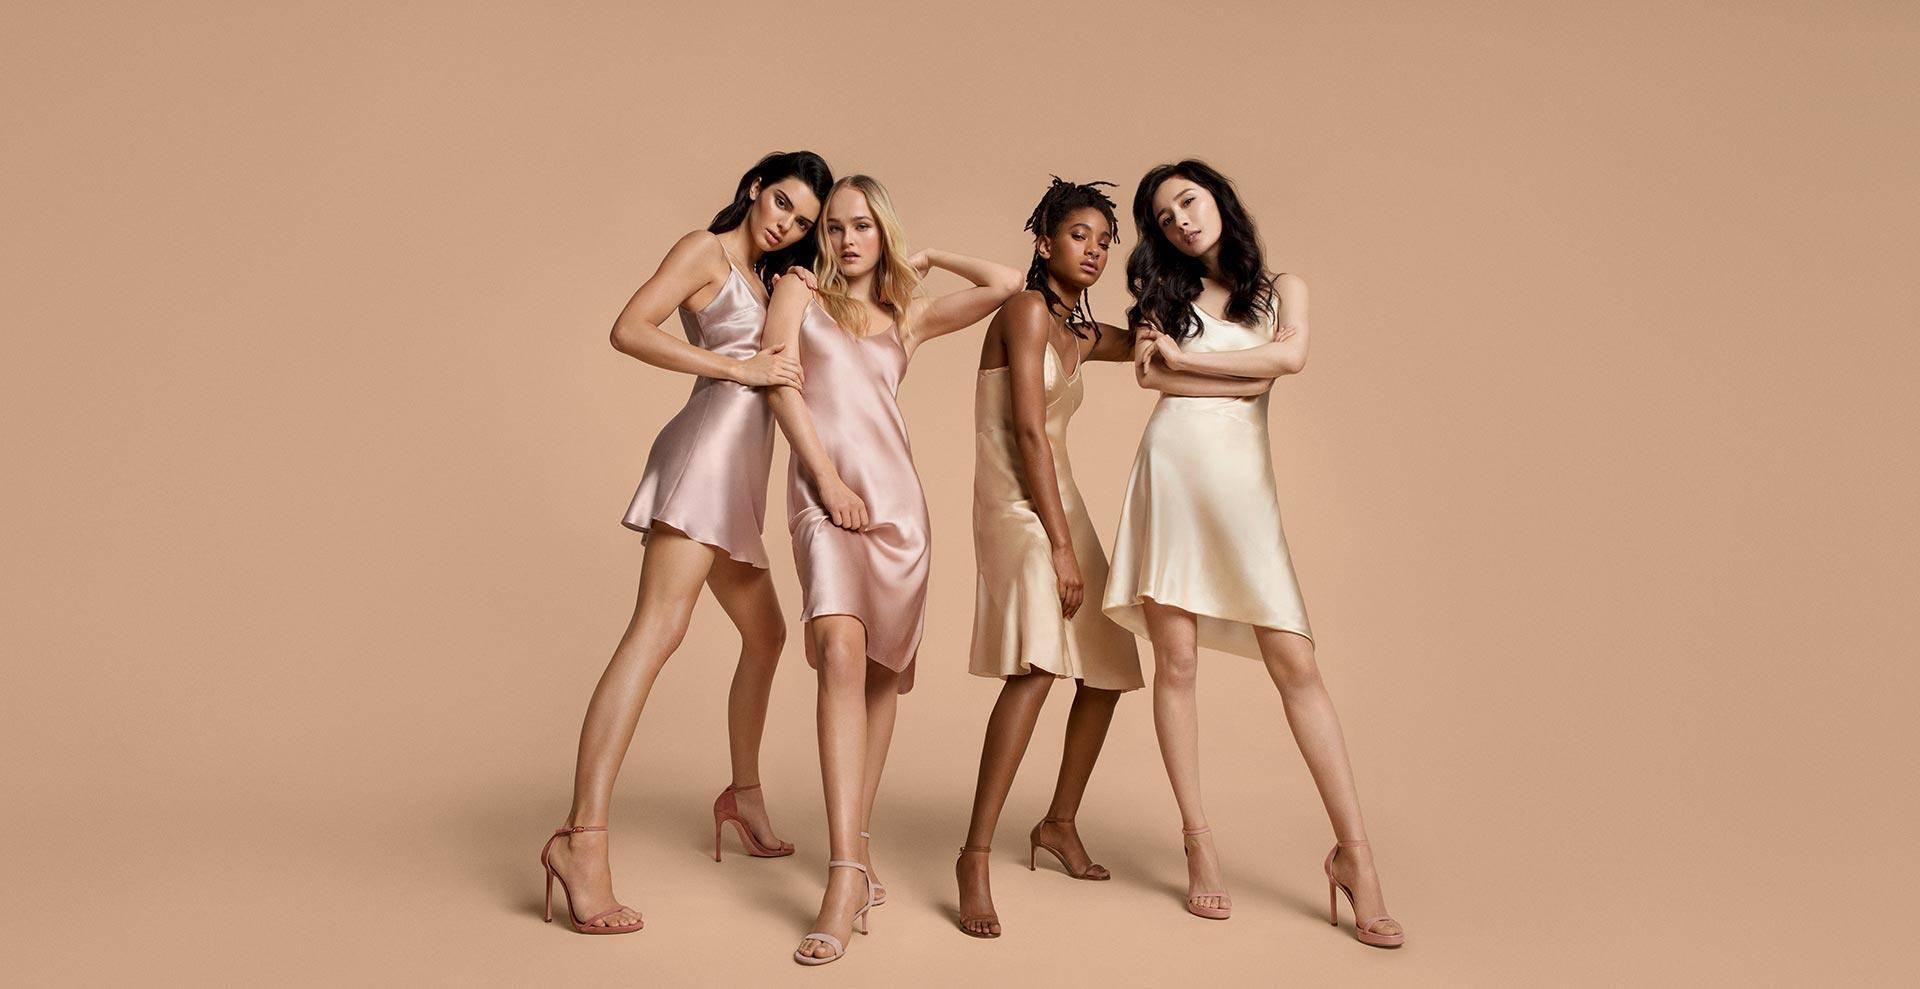 Giày cao gót Kendall Jenner Dương Mịch